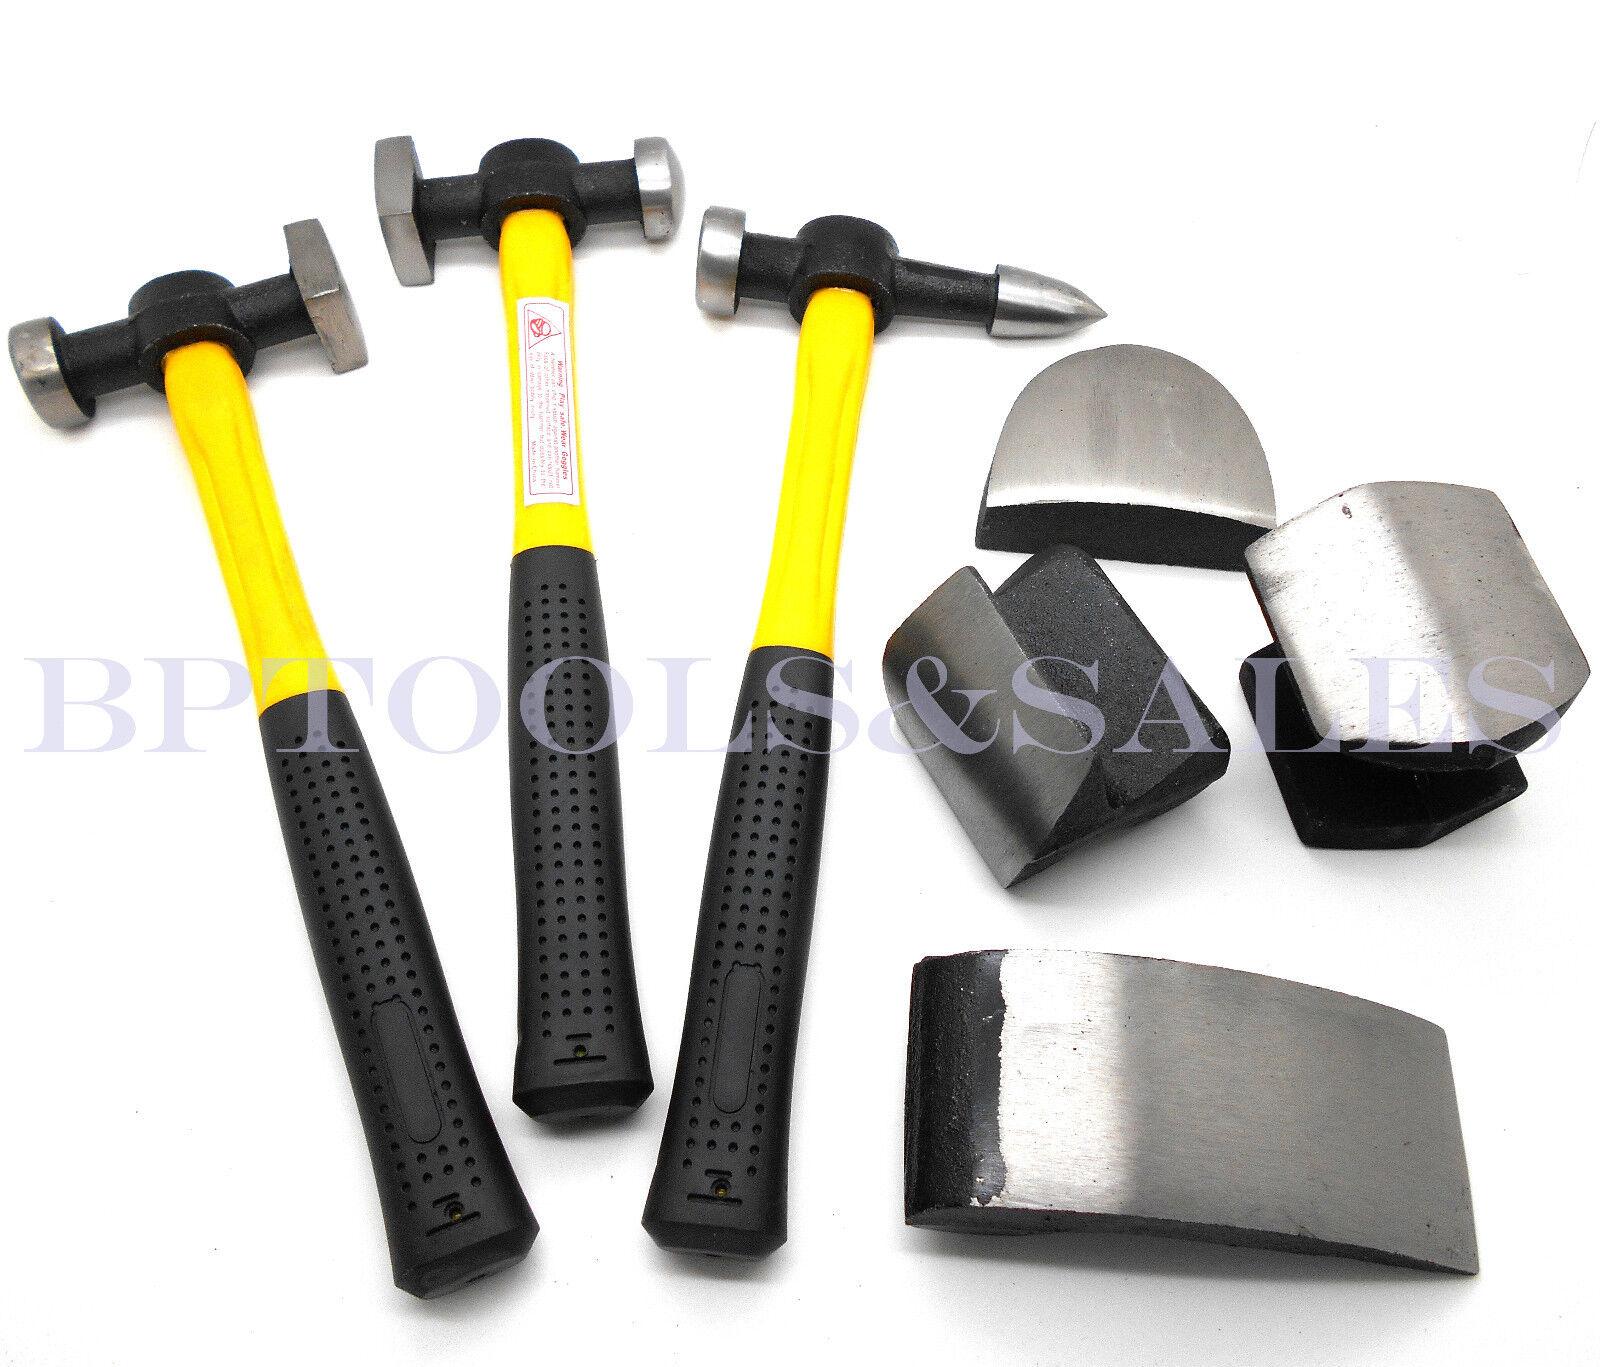 7 Pc Auto Body Fiberglass Fender Repair Tool Hammer Dolly Dent Bender Auto Kit